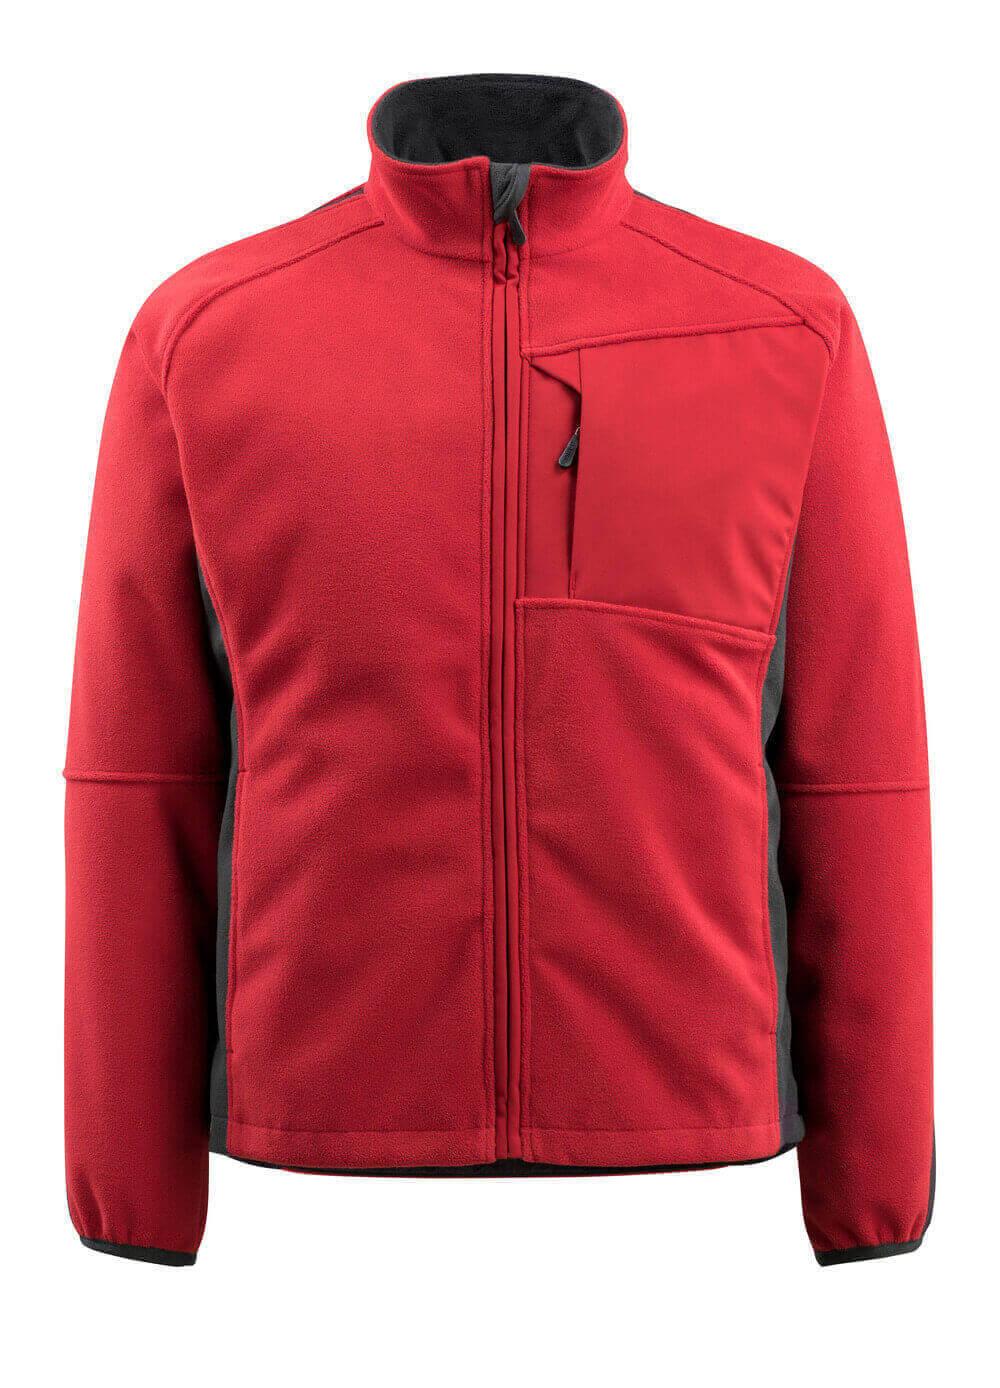 15603-259-0209 Fleece jas - rood/zwart